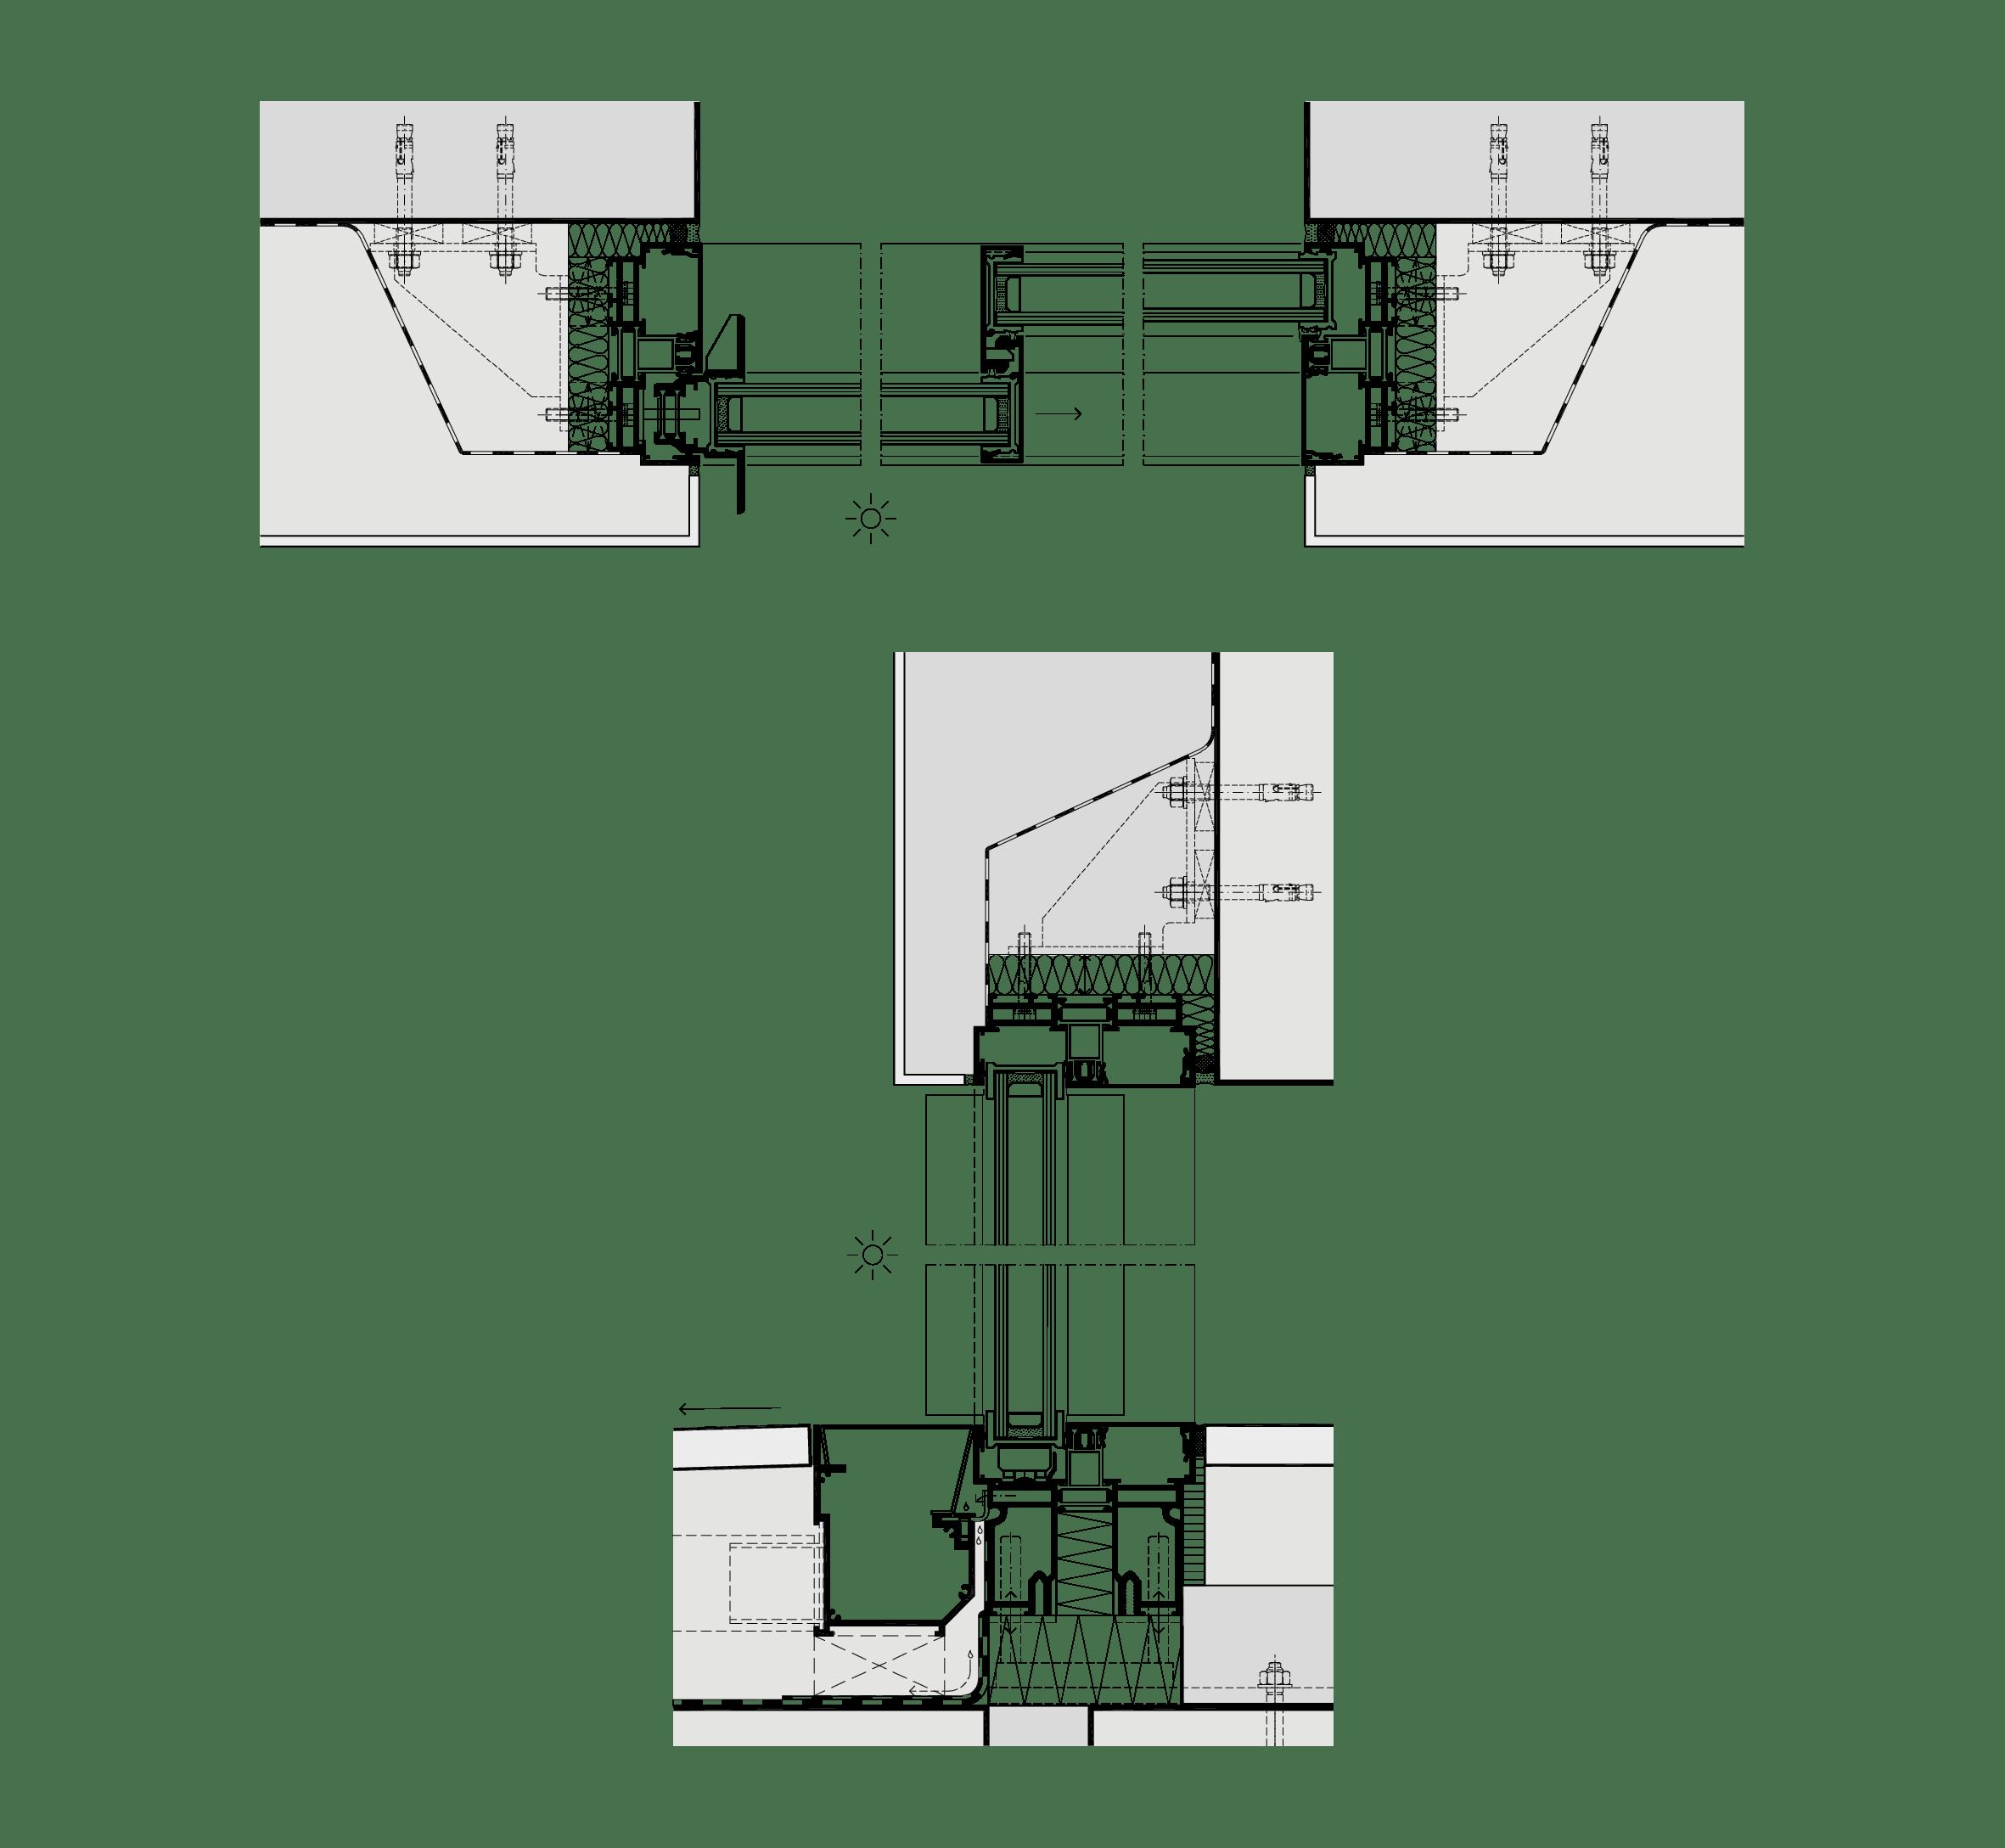 teknologi Technical Drawing Sky Frame 2.png 2362x2177 Q90 Subsampling 2